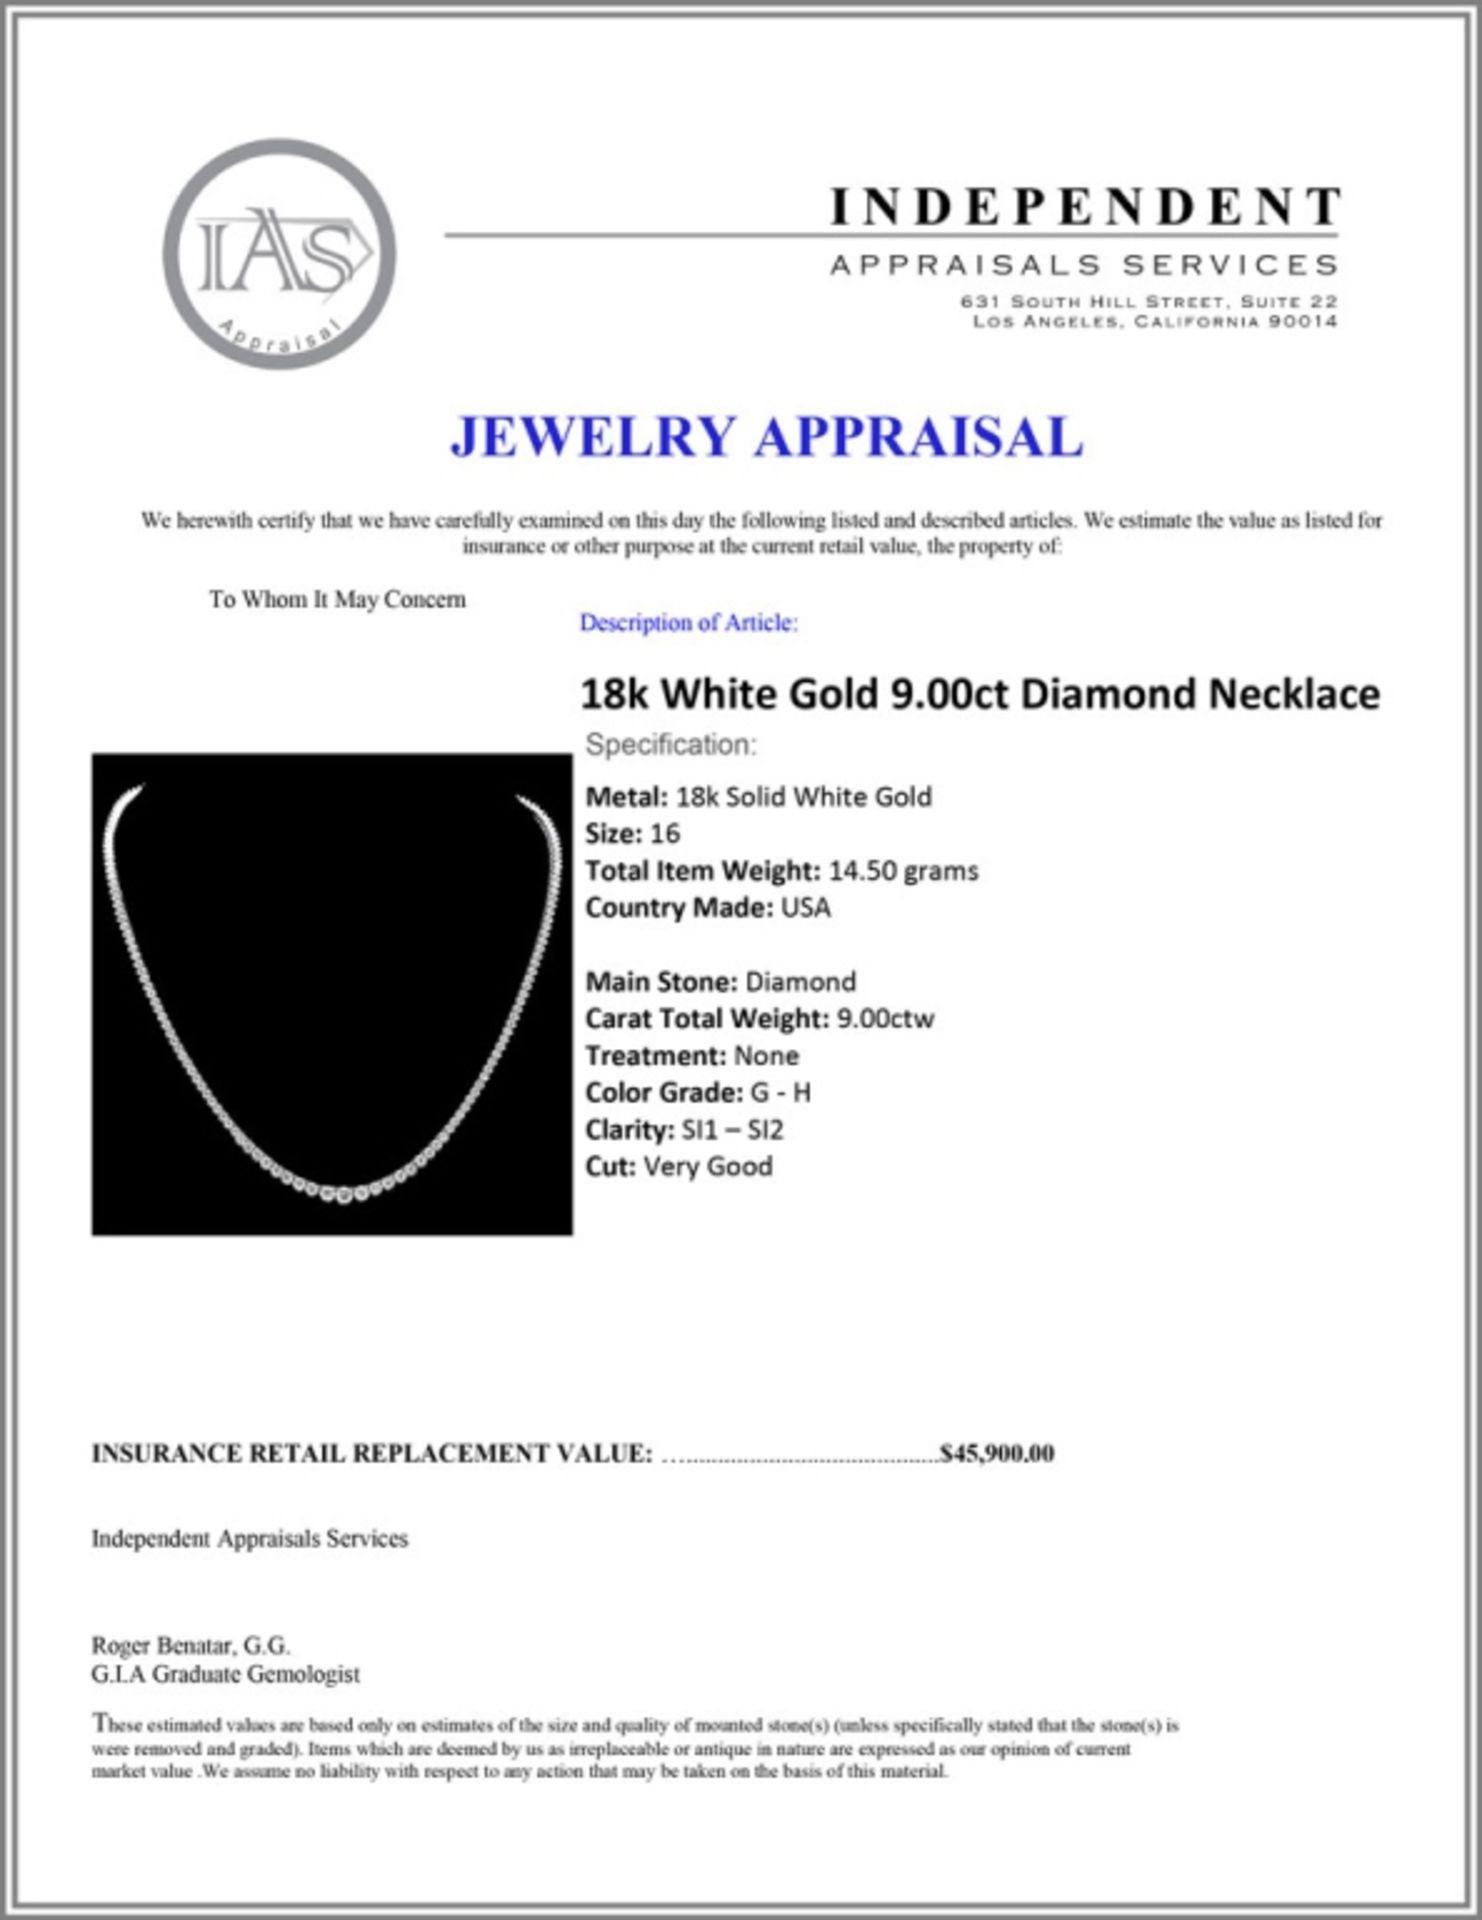 18k White Gold 9.00ct Diamond Necklace - Image 5 of 5